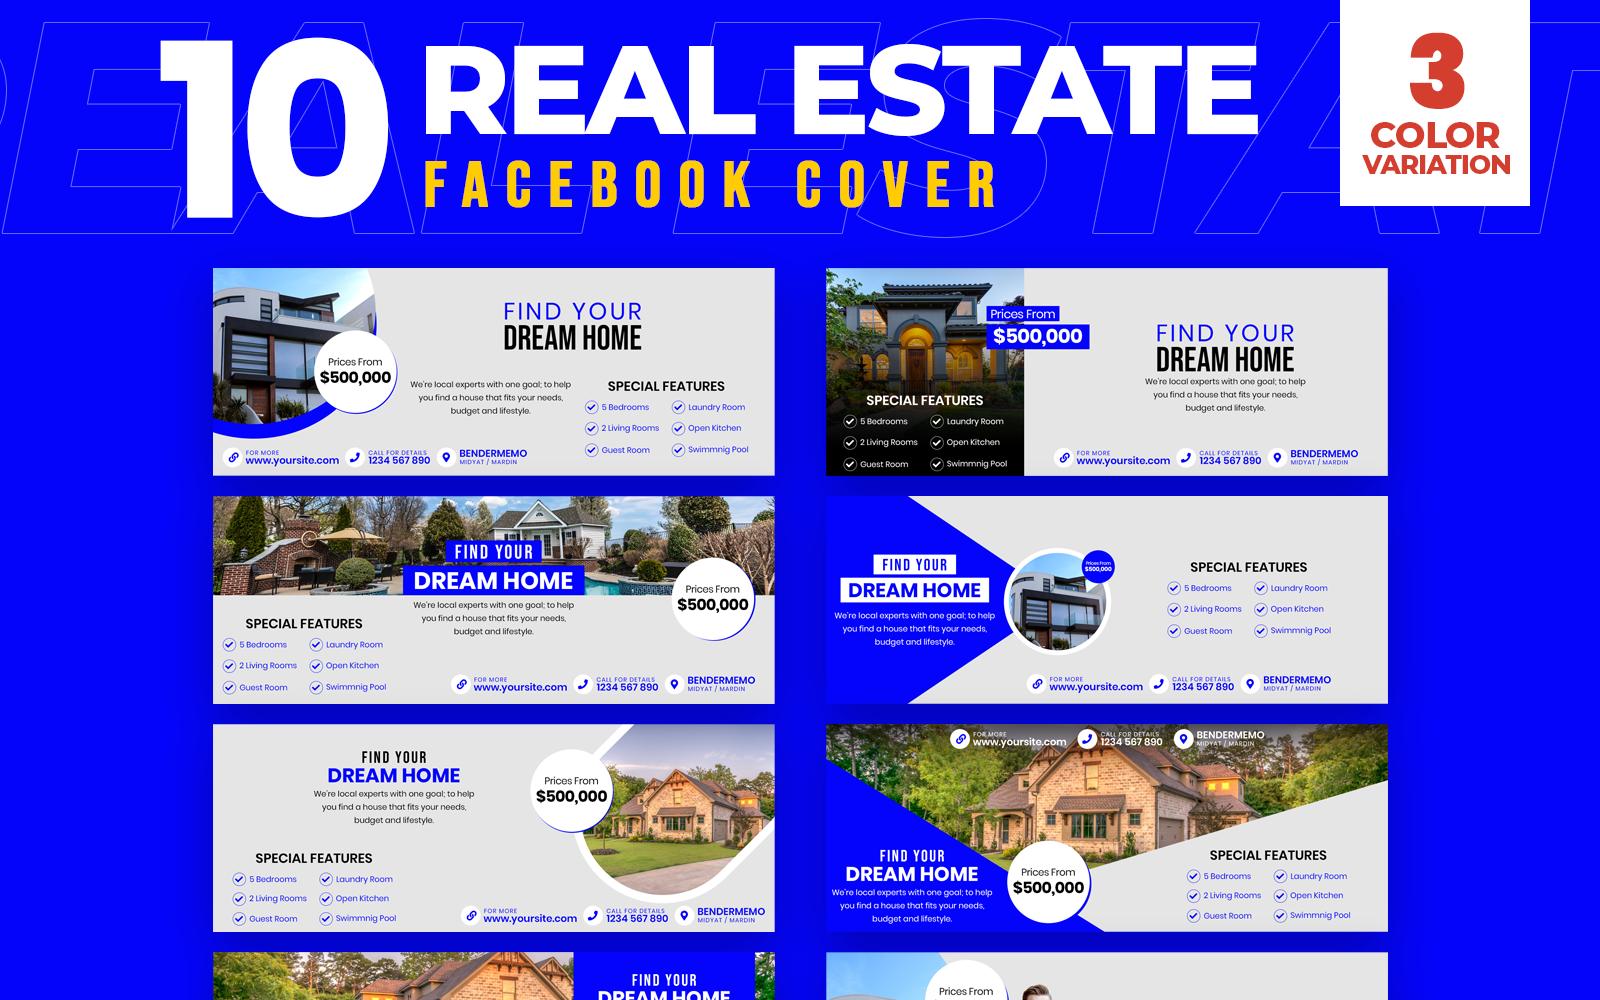 Real Estate 10 Facebook Cover Social Media